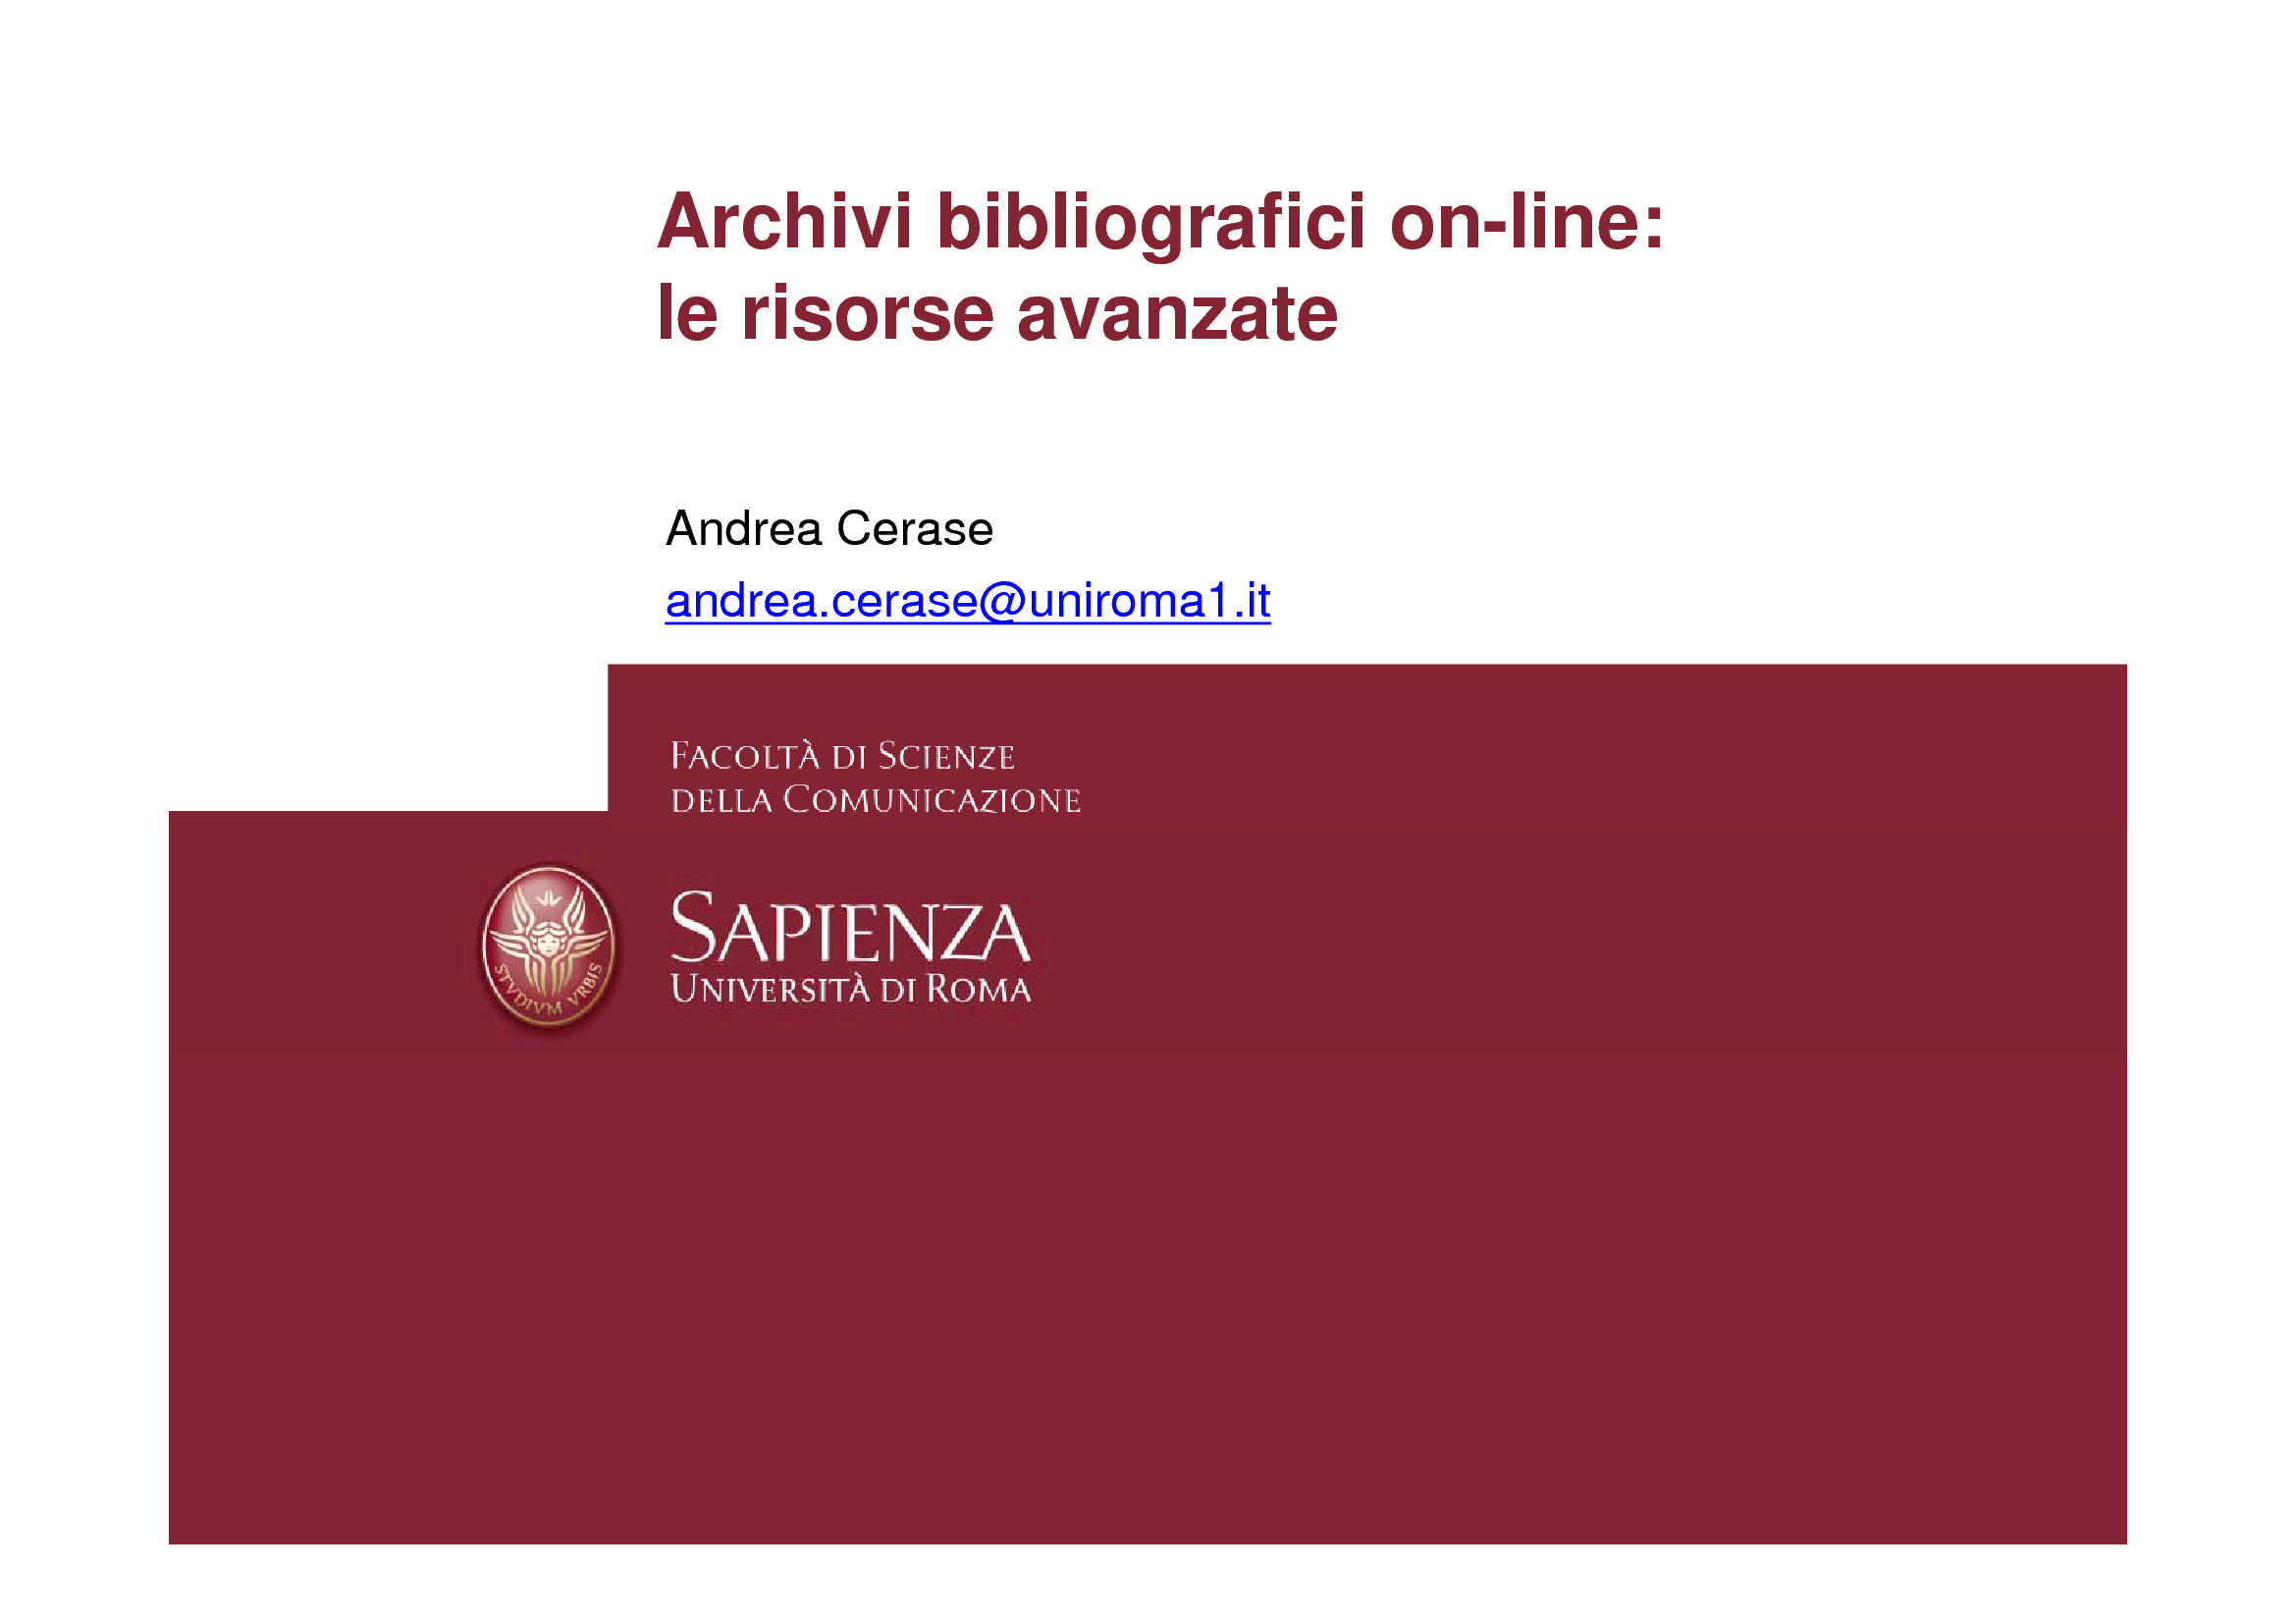 Tesi - Bibliografia online